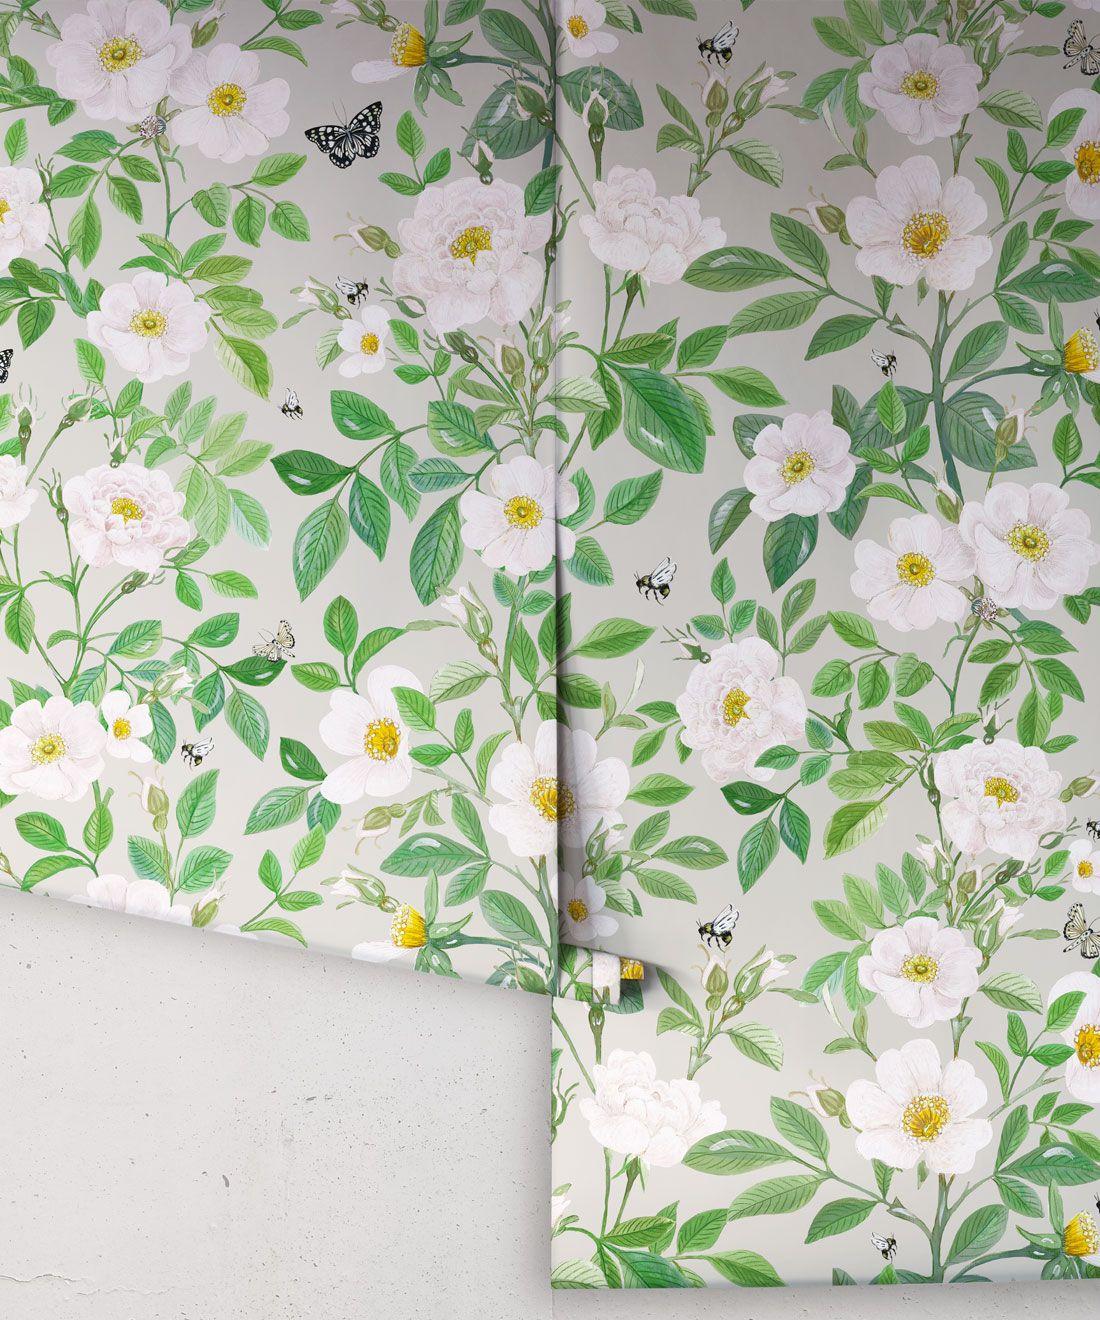 Rosa Wallpaper • Floral Wallpaper • Beige • Rolls